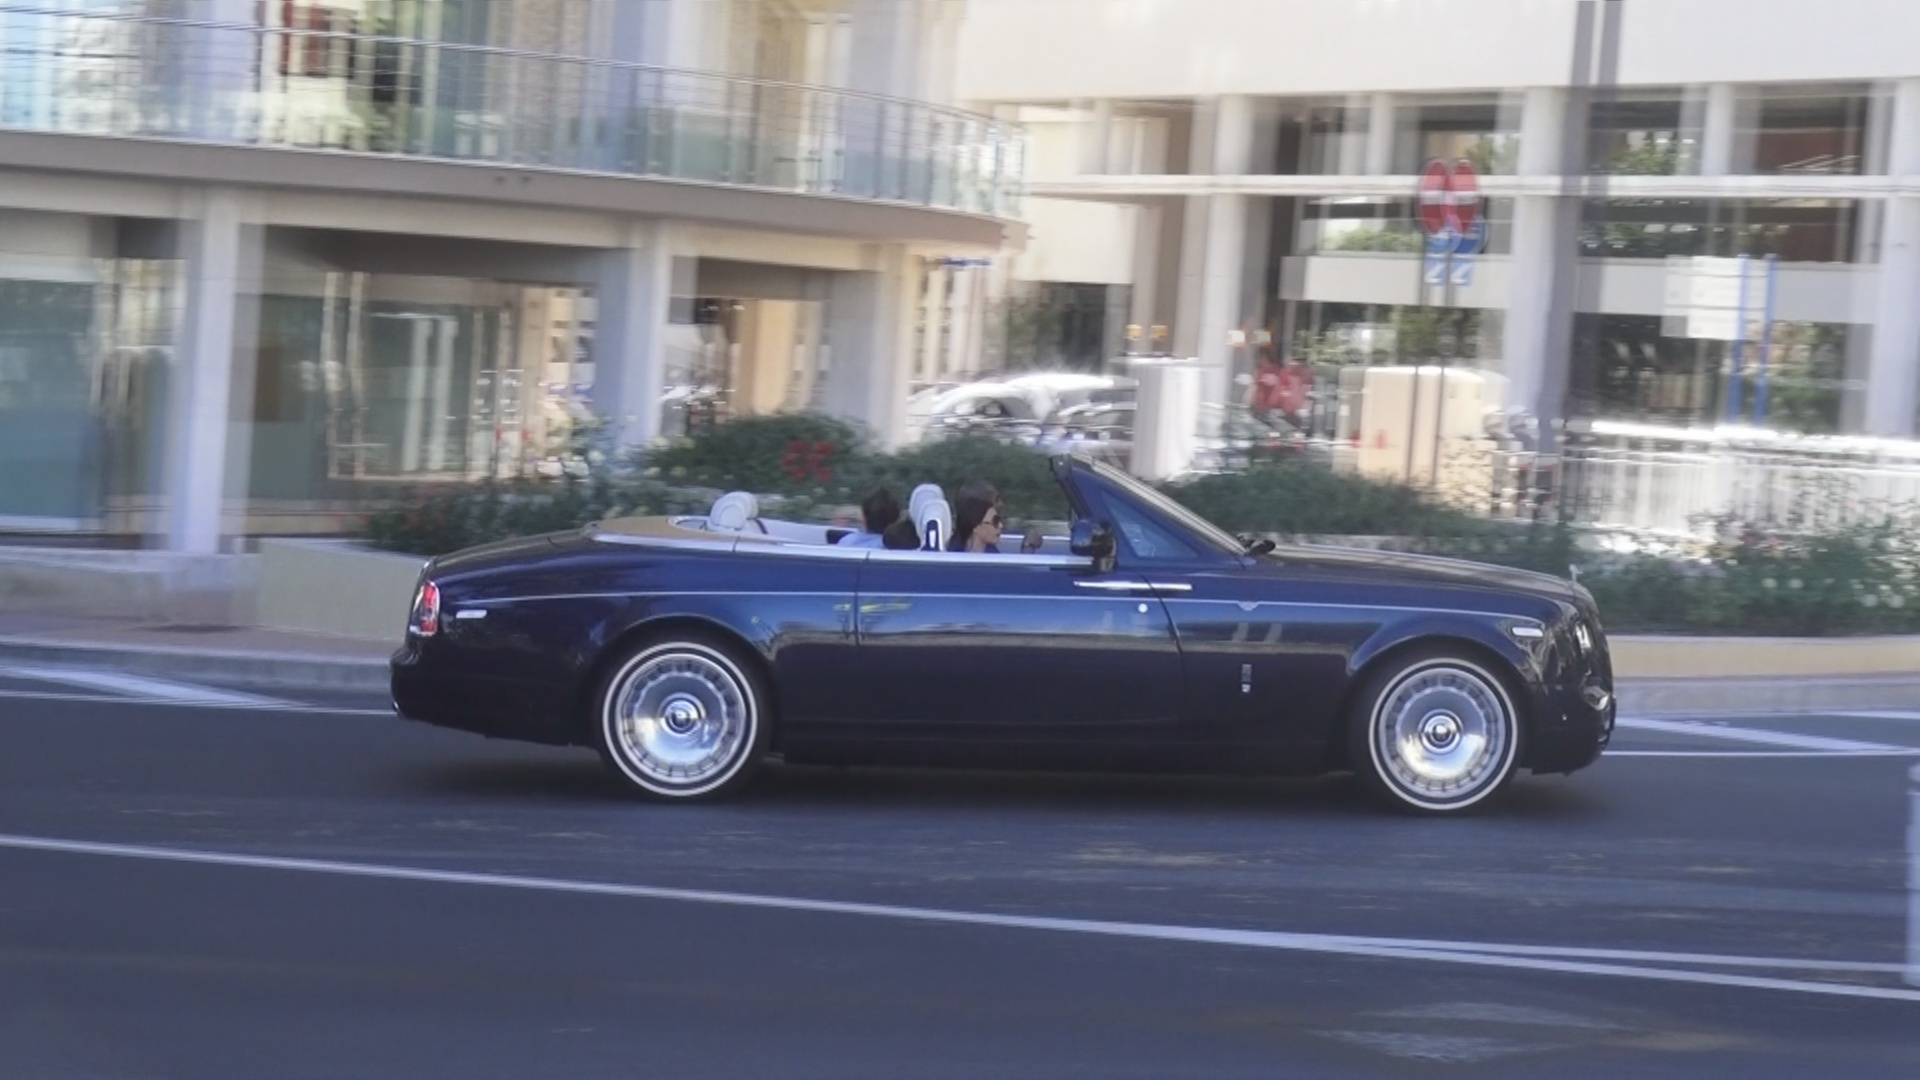 Rolls Royce Drophead - N-9102 (Dubai)